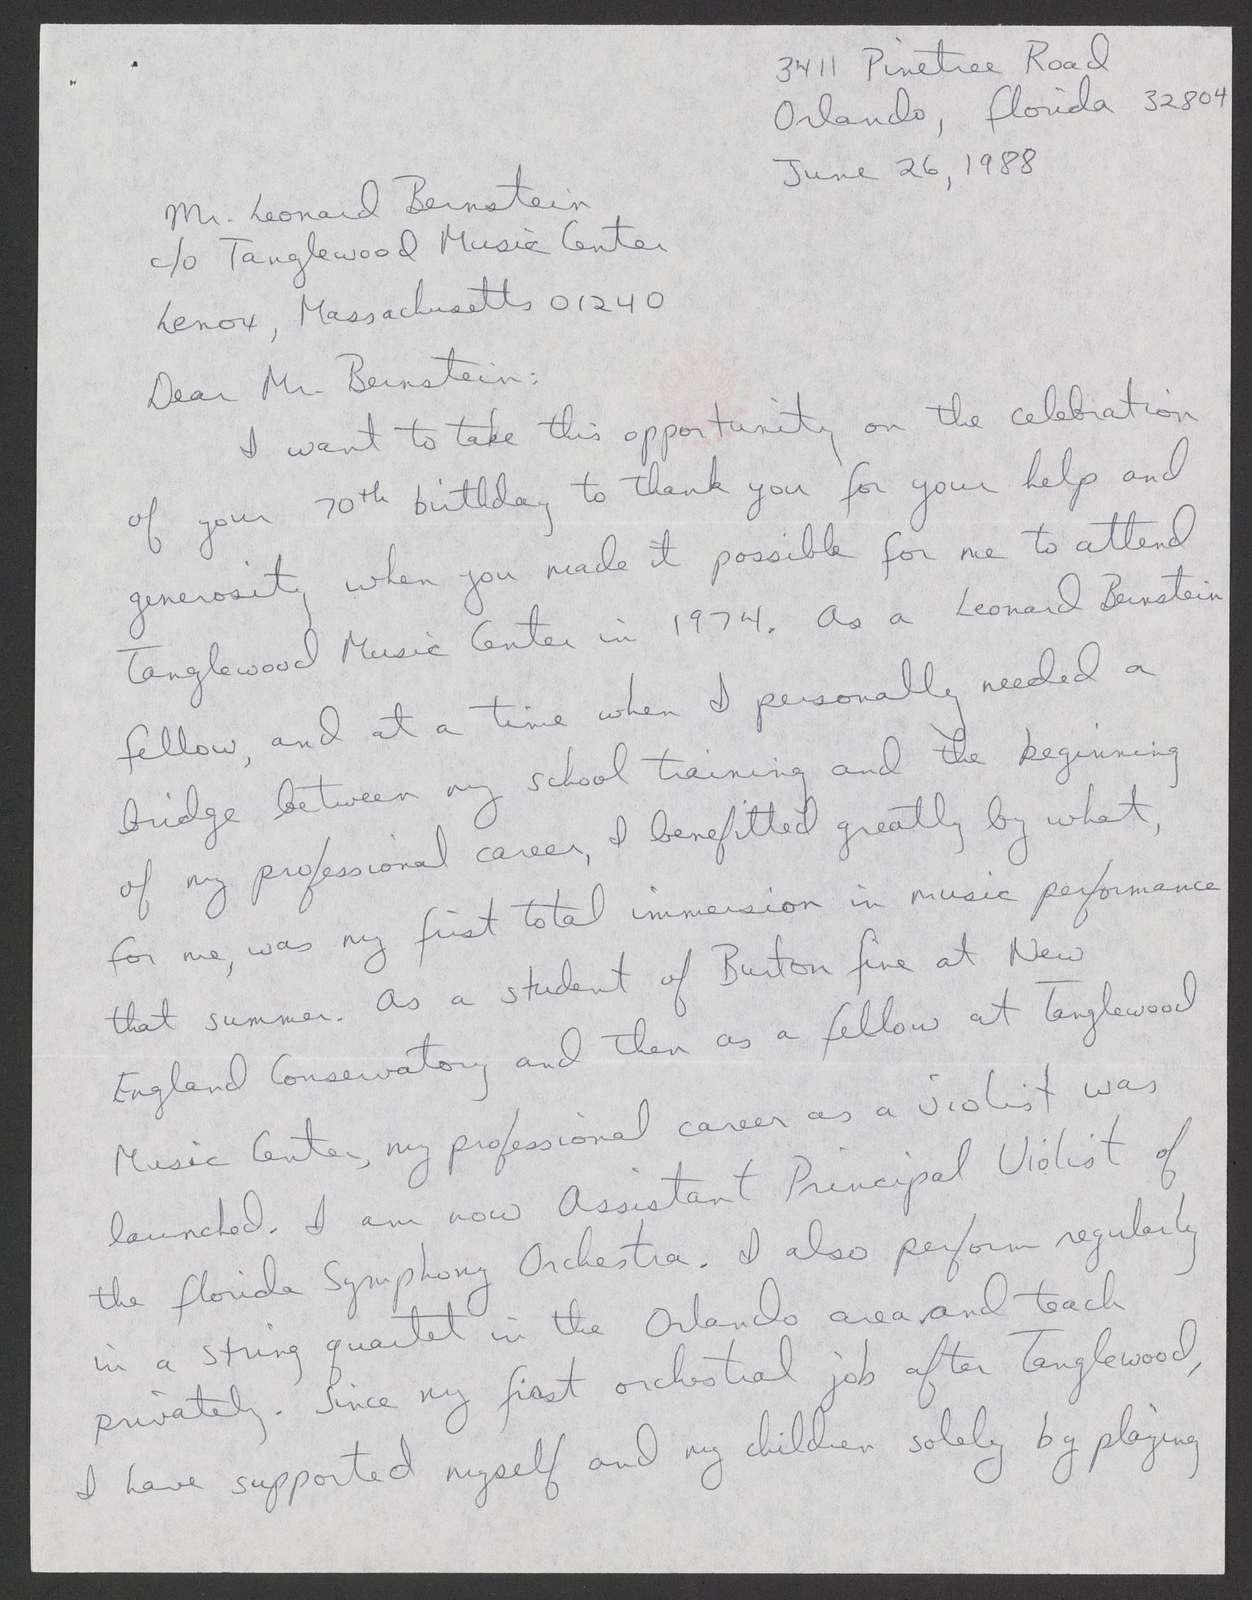 Barbara Morrell Rizzo to Leonard Bernstein, June 26, 1988